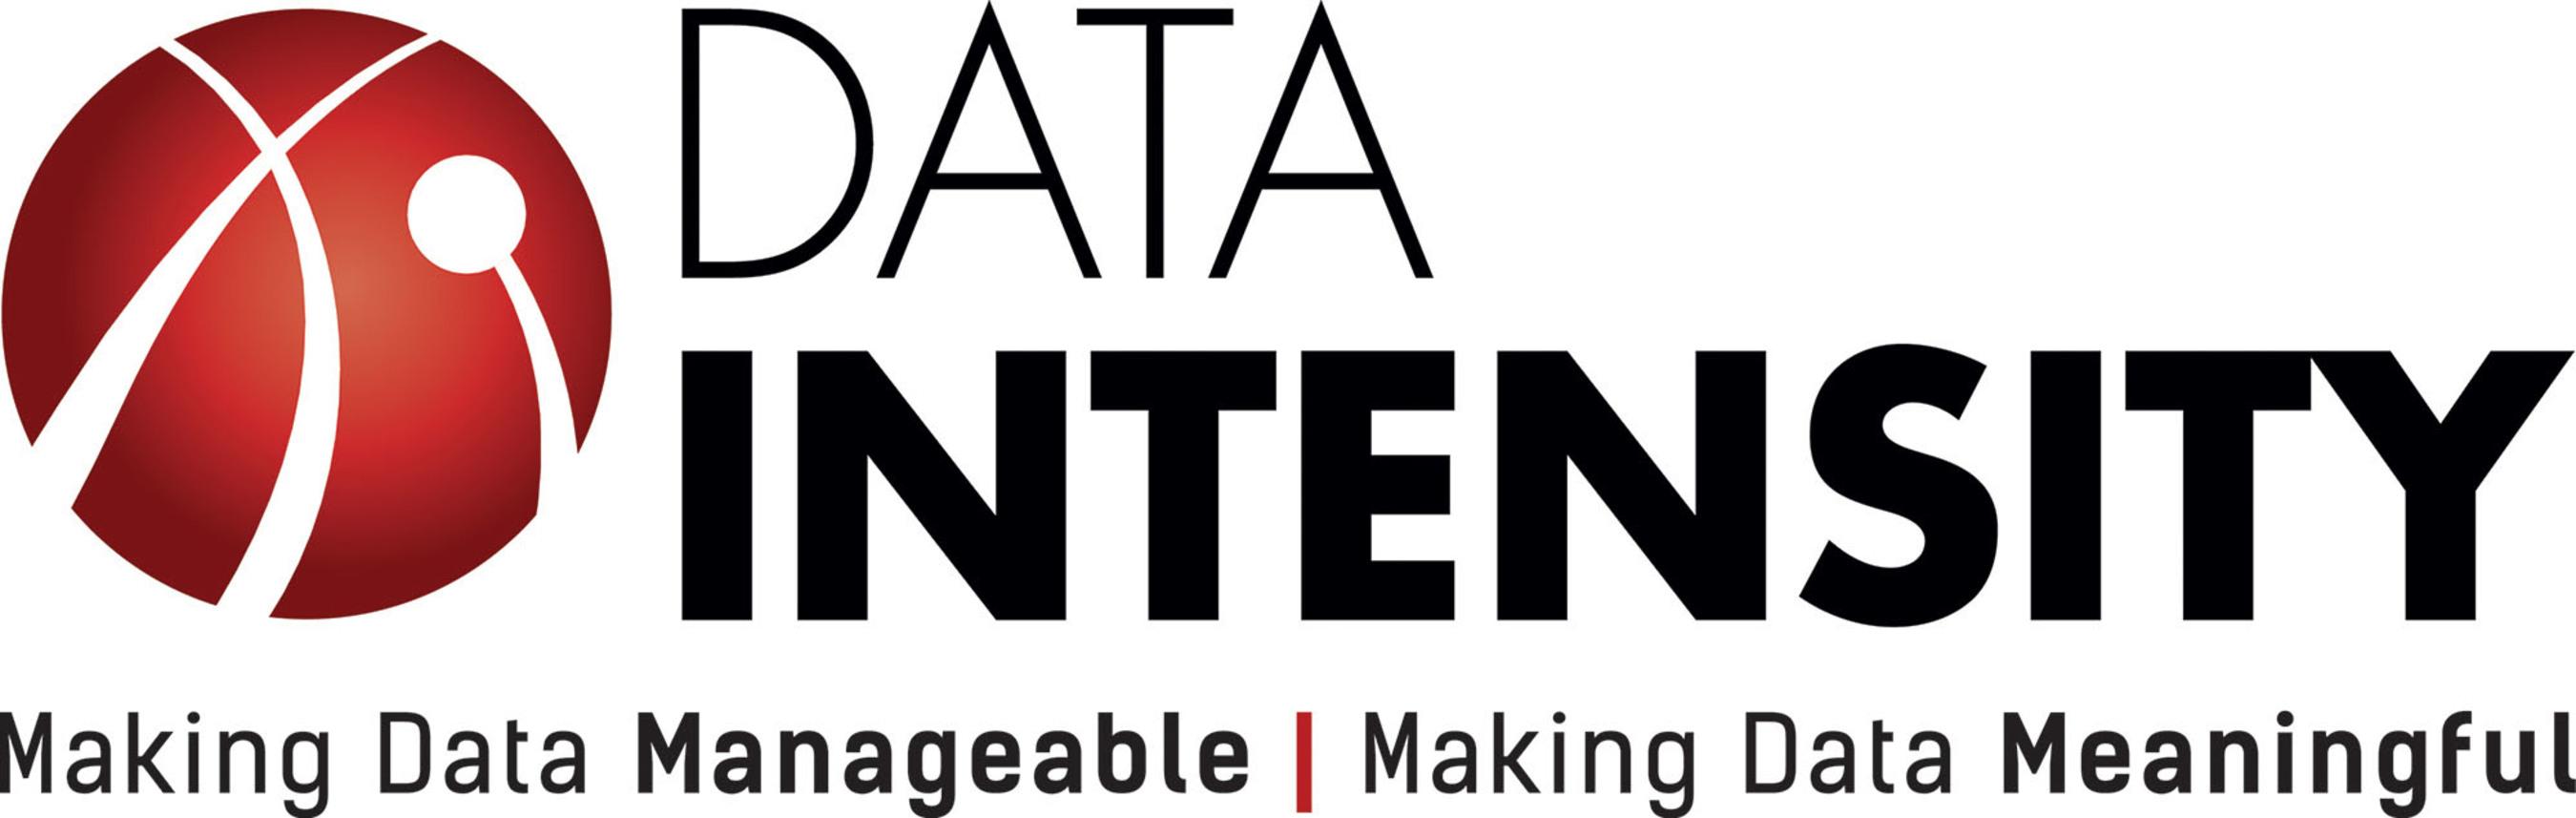 EnterpriseDB and Data Intensity Partner to Meet Rising